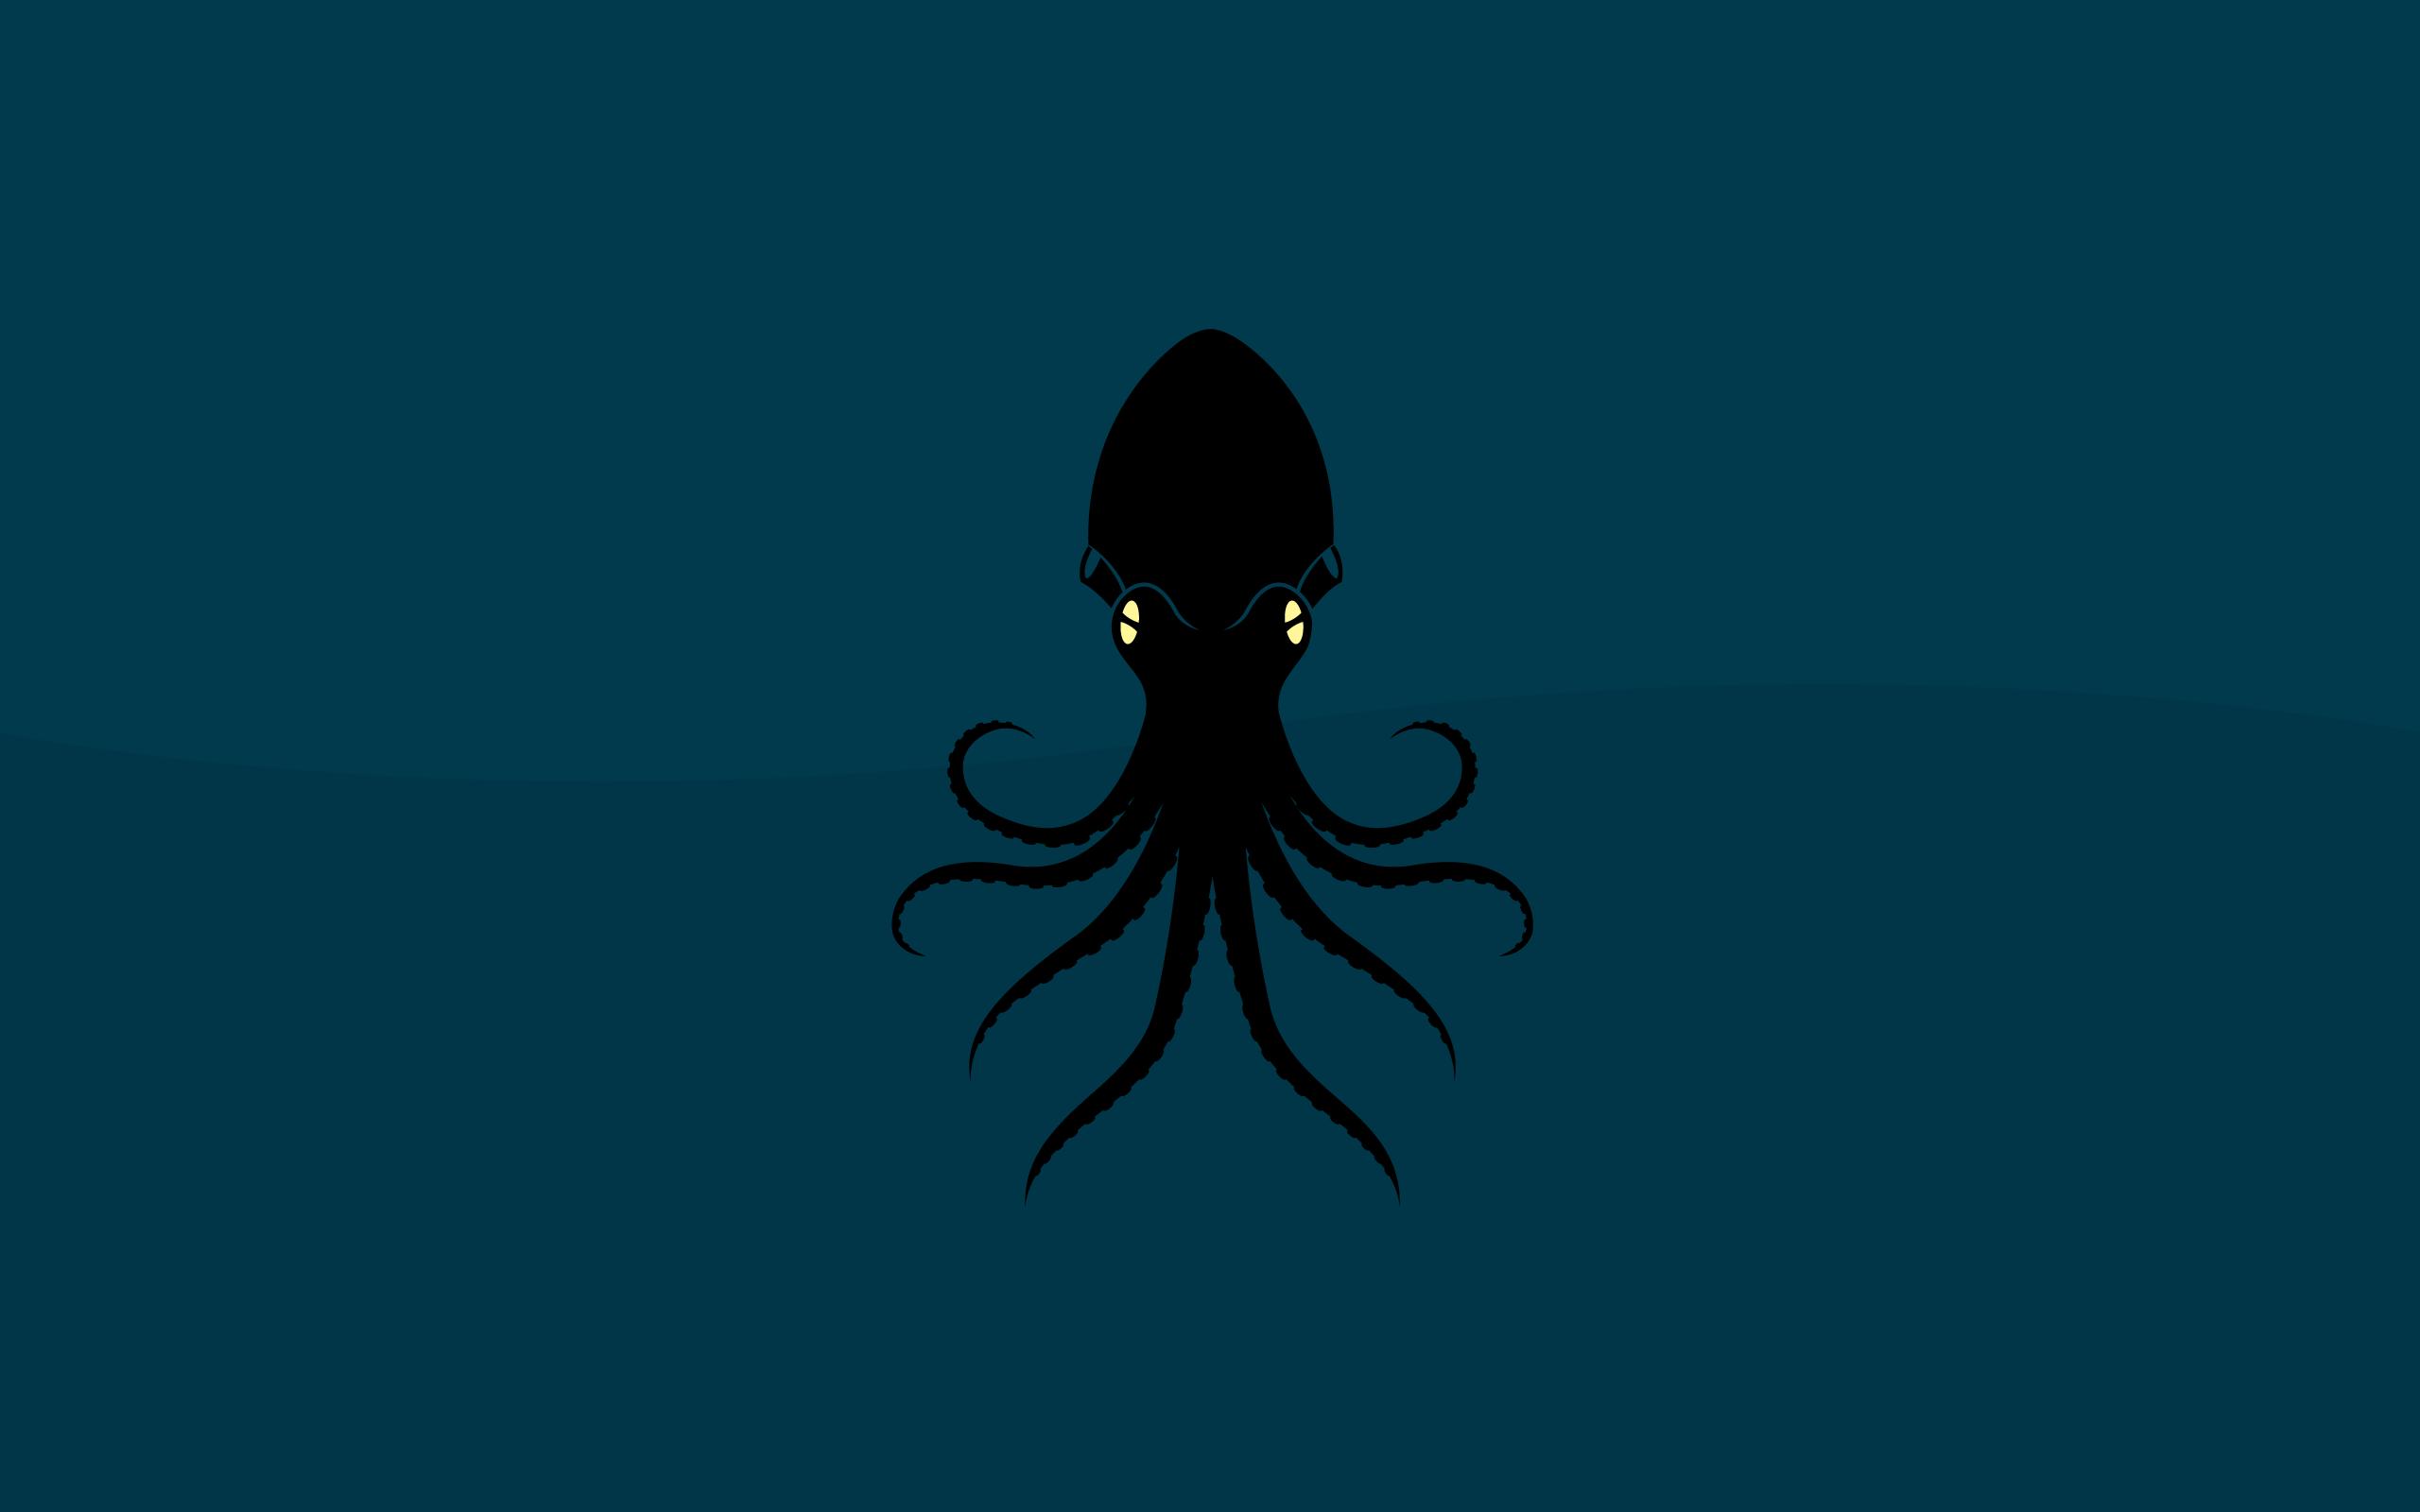 Octopus 2560x1600 Minimalist desktop wallpaper, Minimal